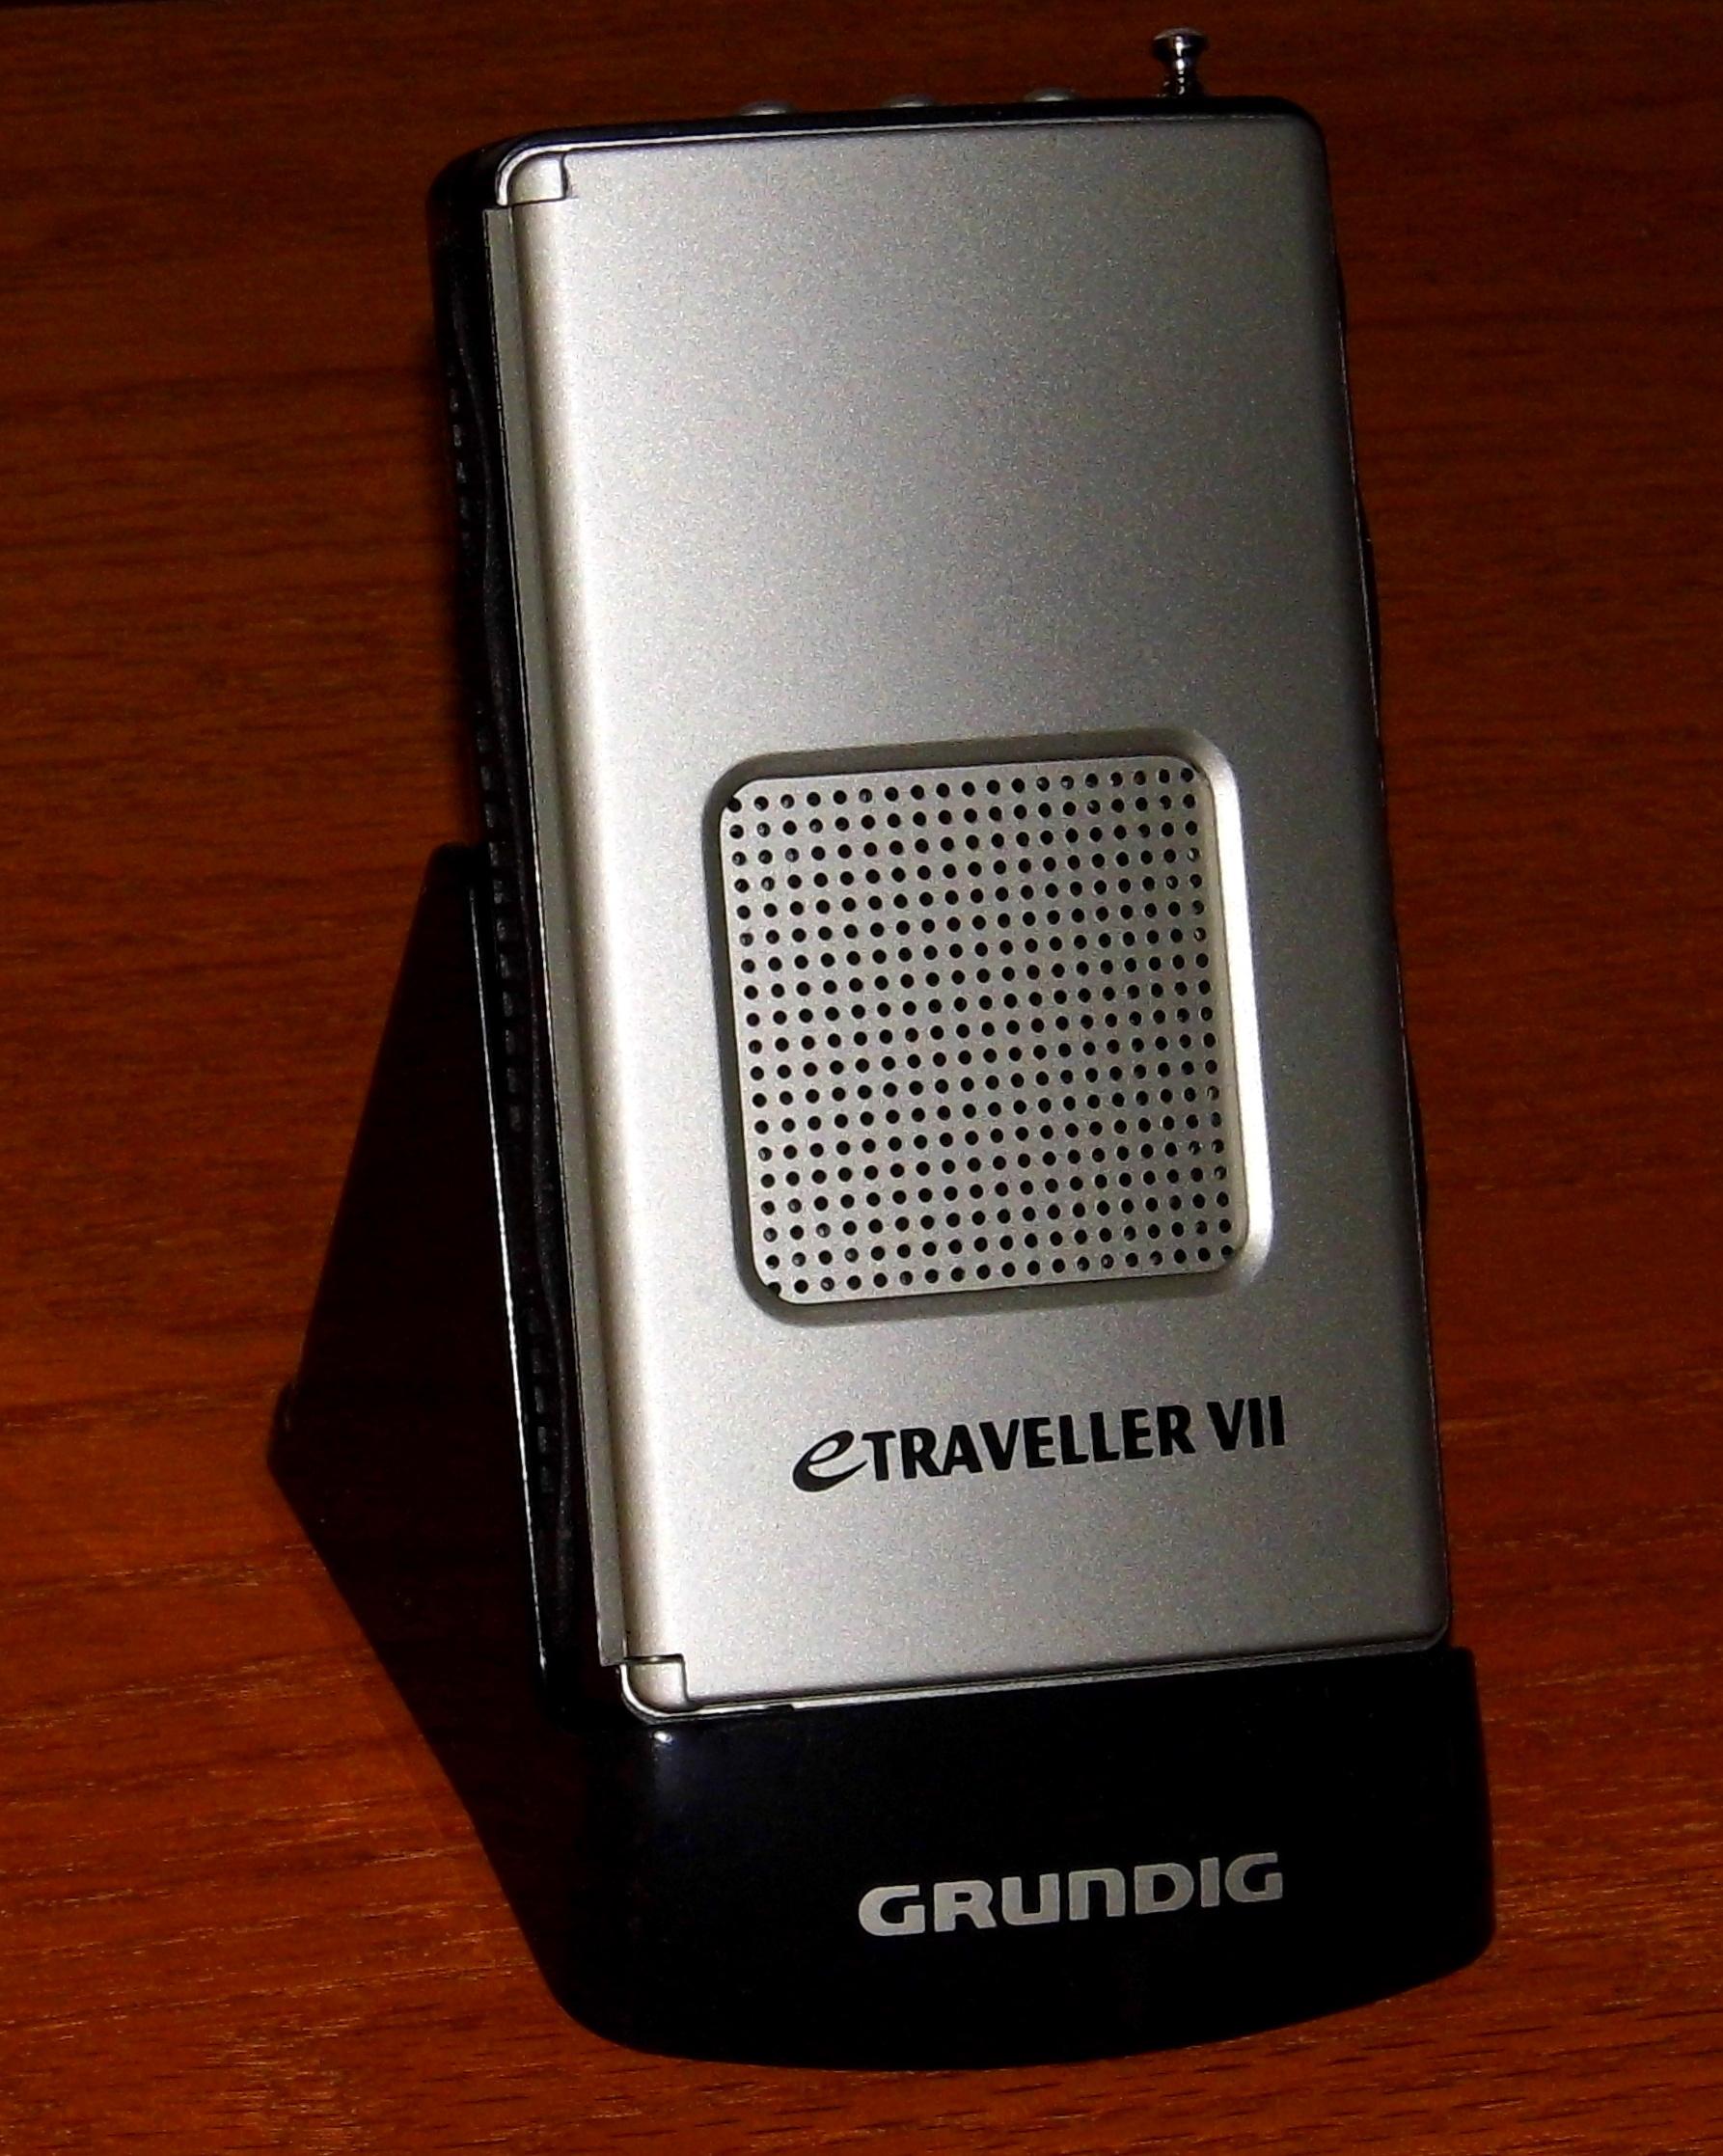 File:Grundig eTraveller VII AM-FM Shortwave Radio, Made In